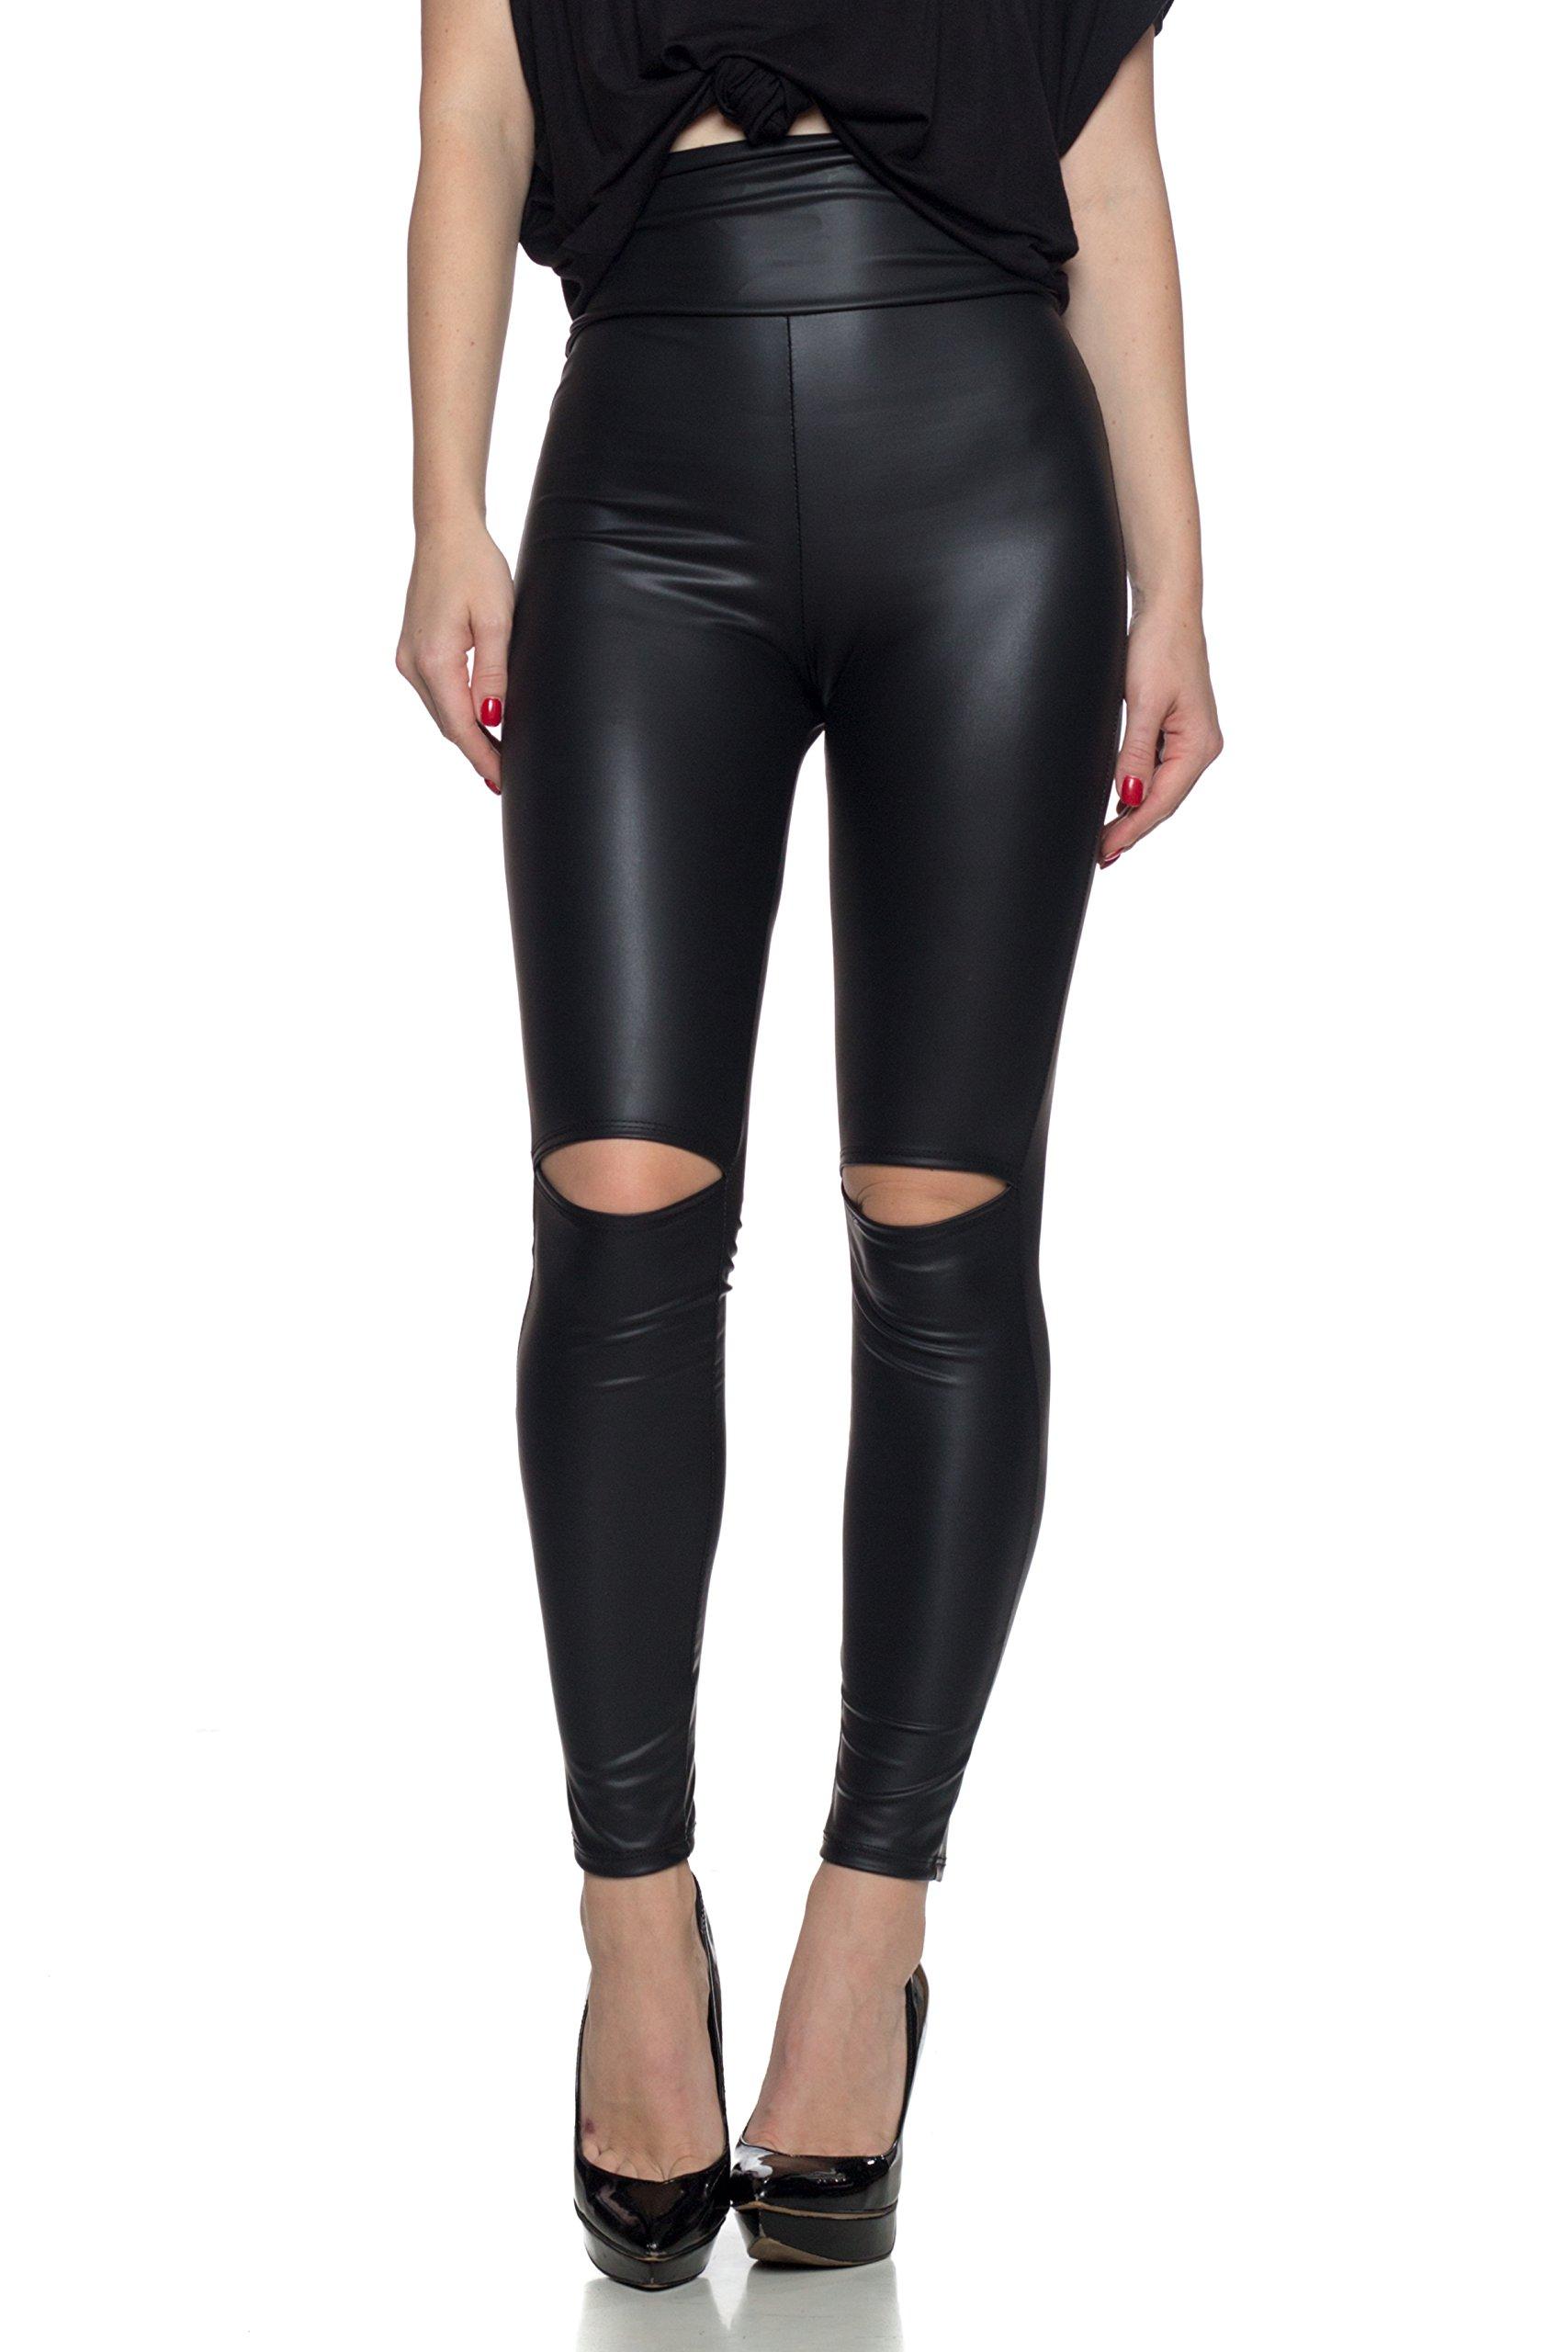 Cemi Ceri J2 Love Women's Knee Slit Faux Leather Legging, Medium, Black